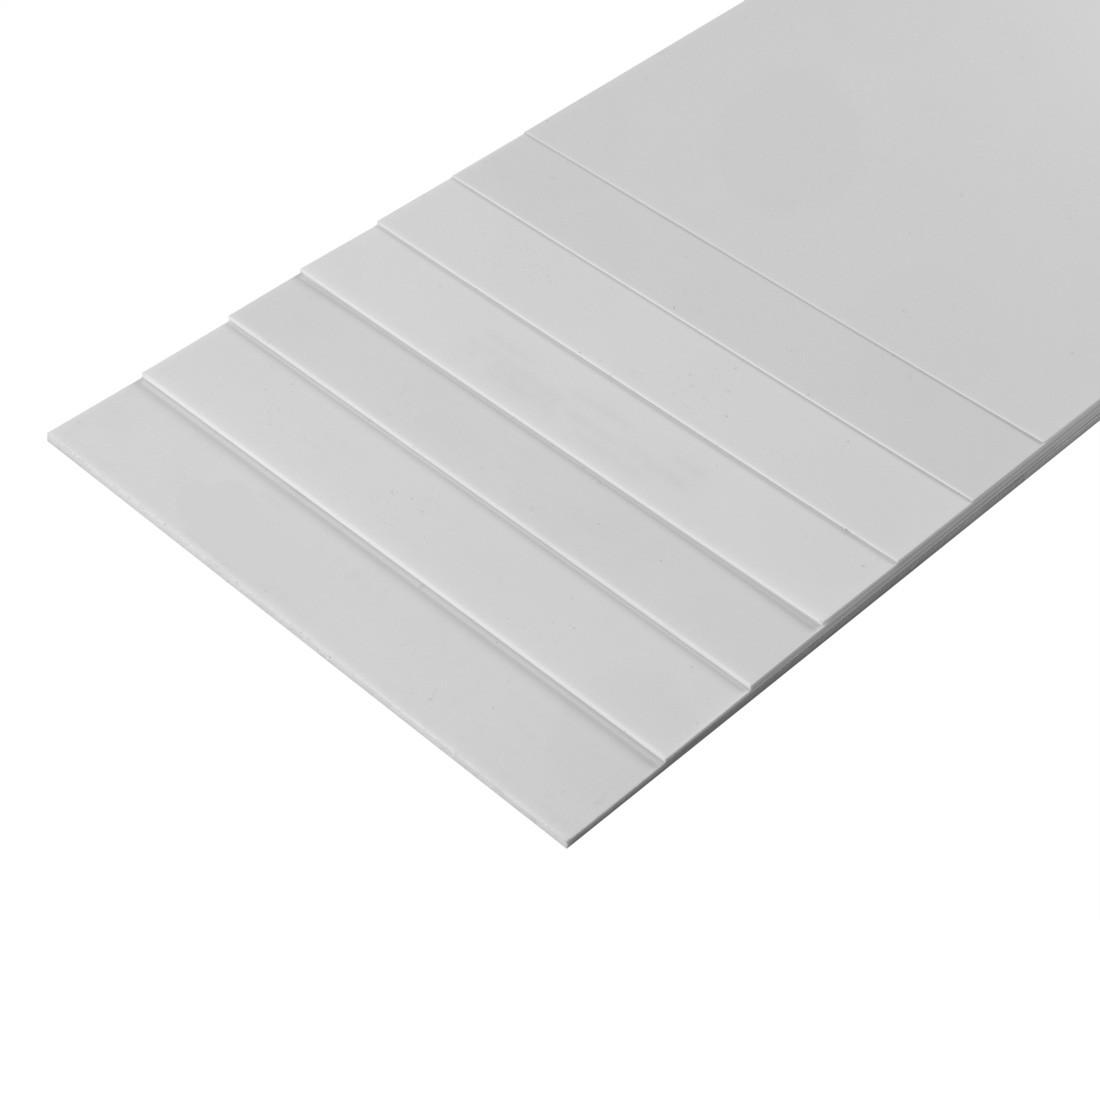 Foglio Styrene bianco mm.194x320  mm.0,30